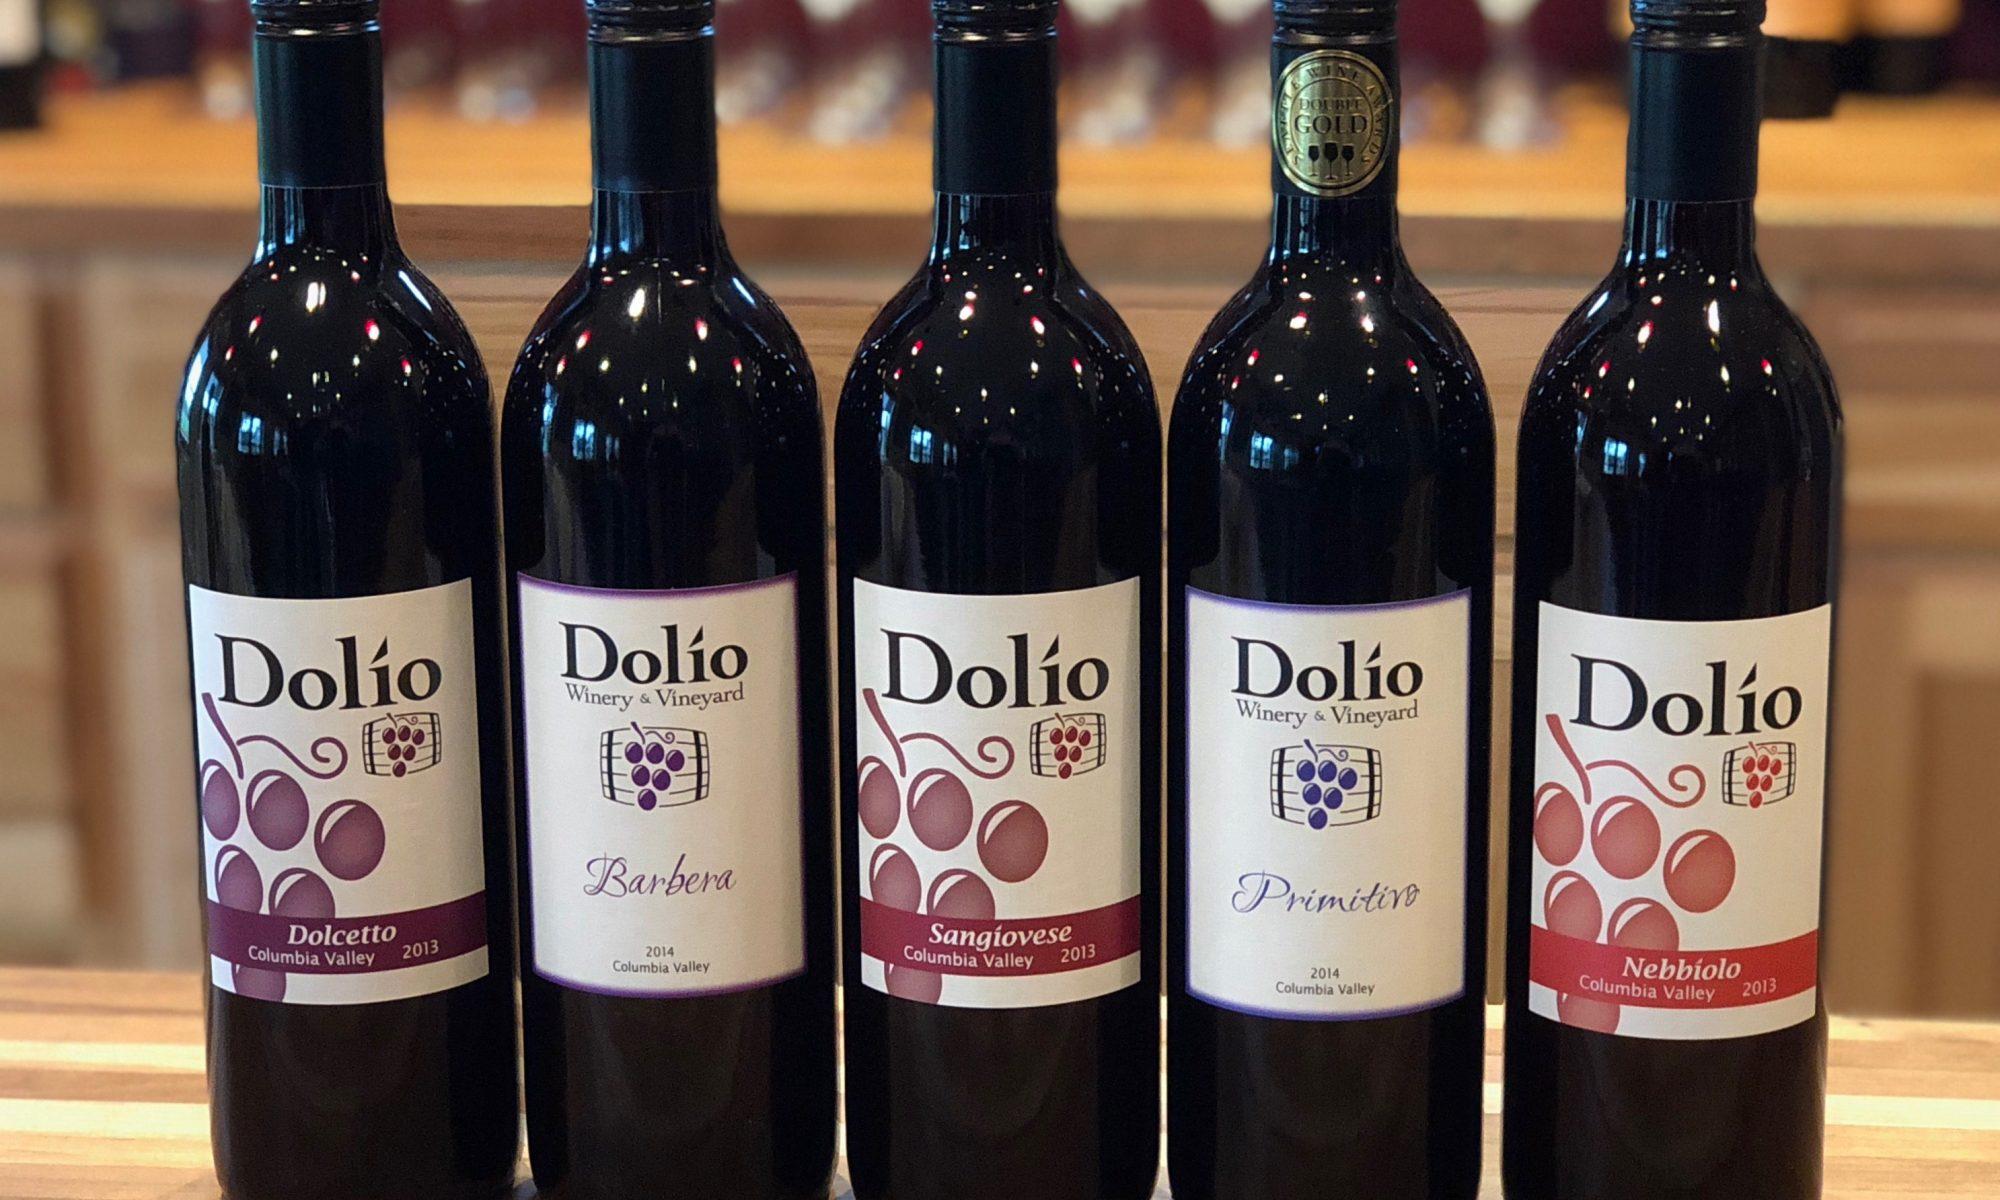 Italian varietals at Dolio Winery including Dolcetto, Barbera, Sangiovese, Primitivo and Nebbiolo